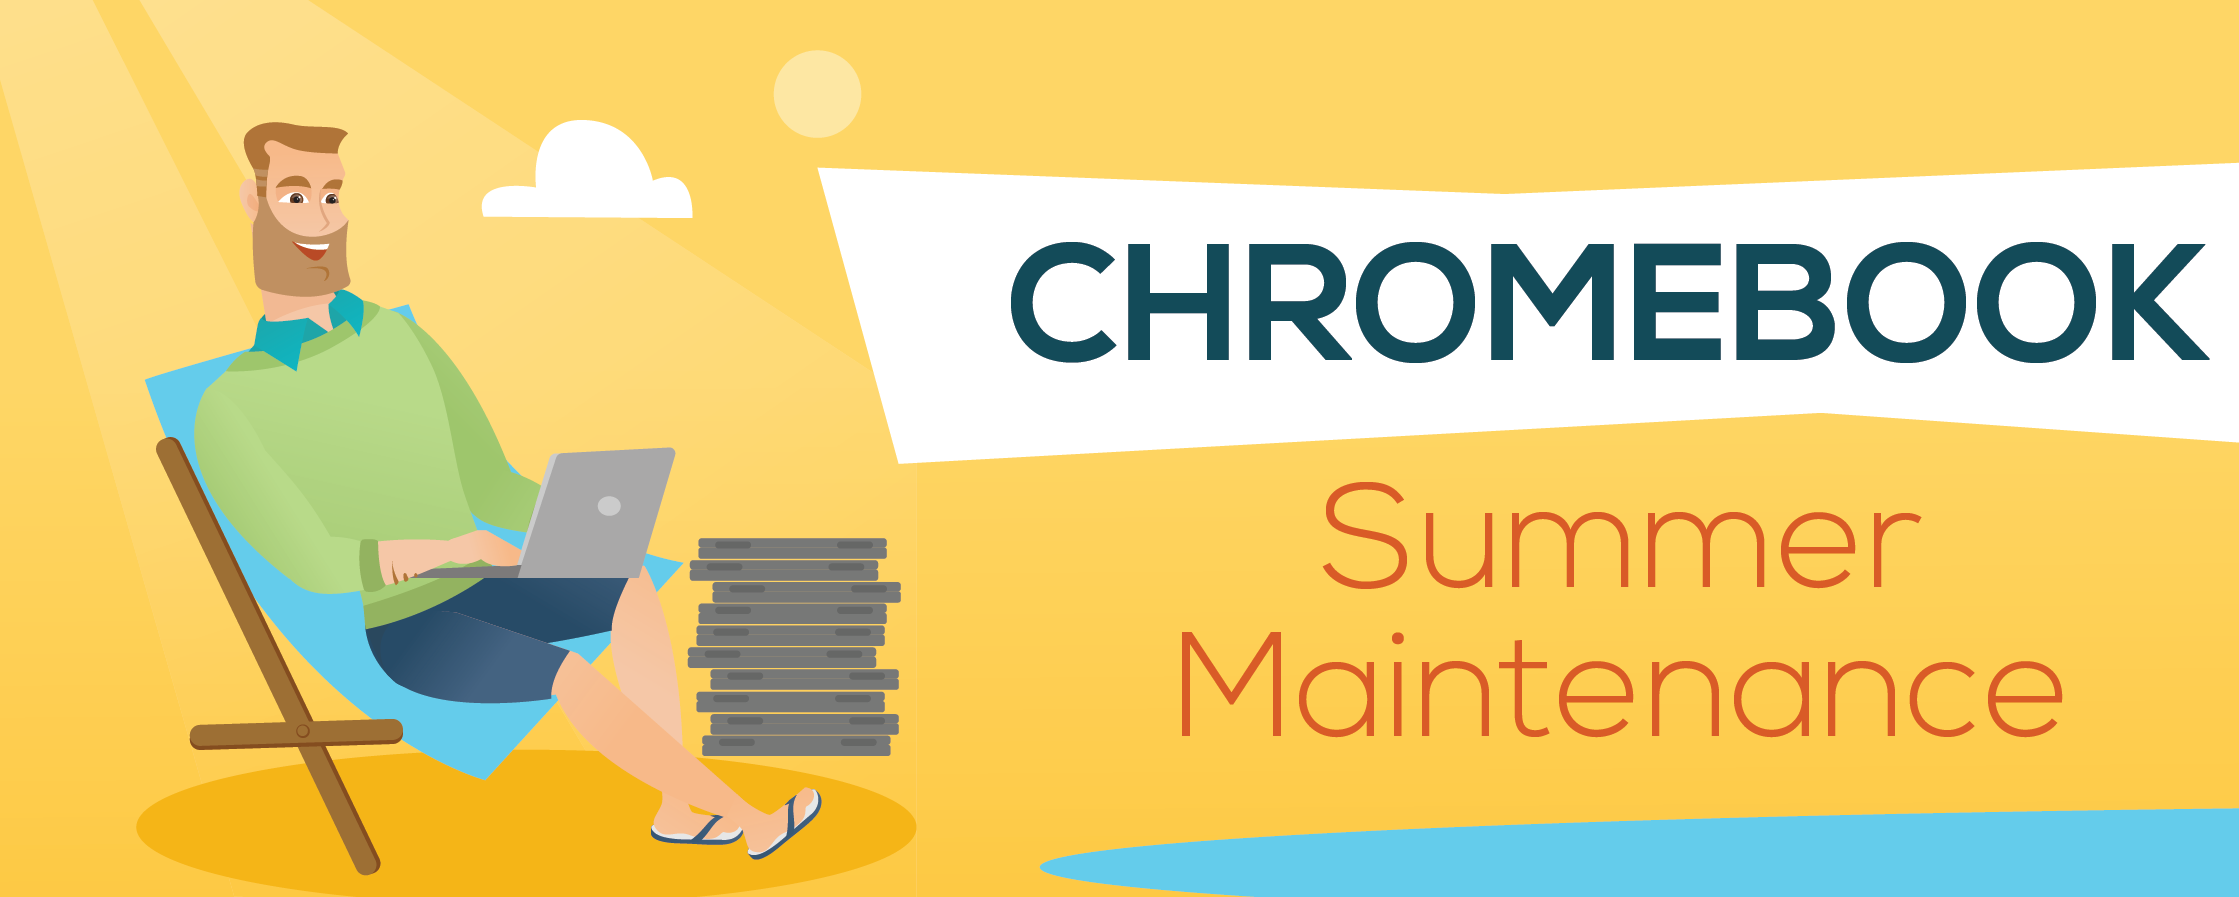 Chromebook Summer Maintenance Graphic